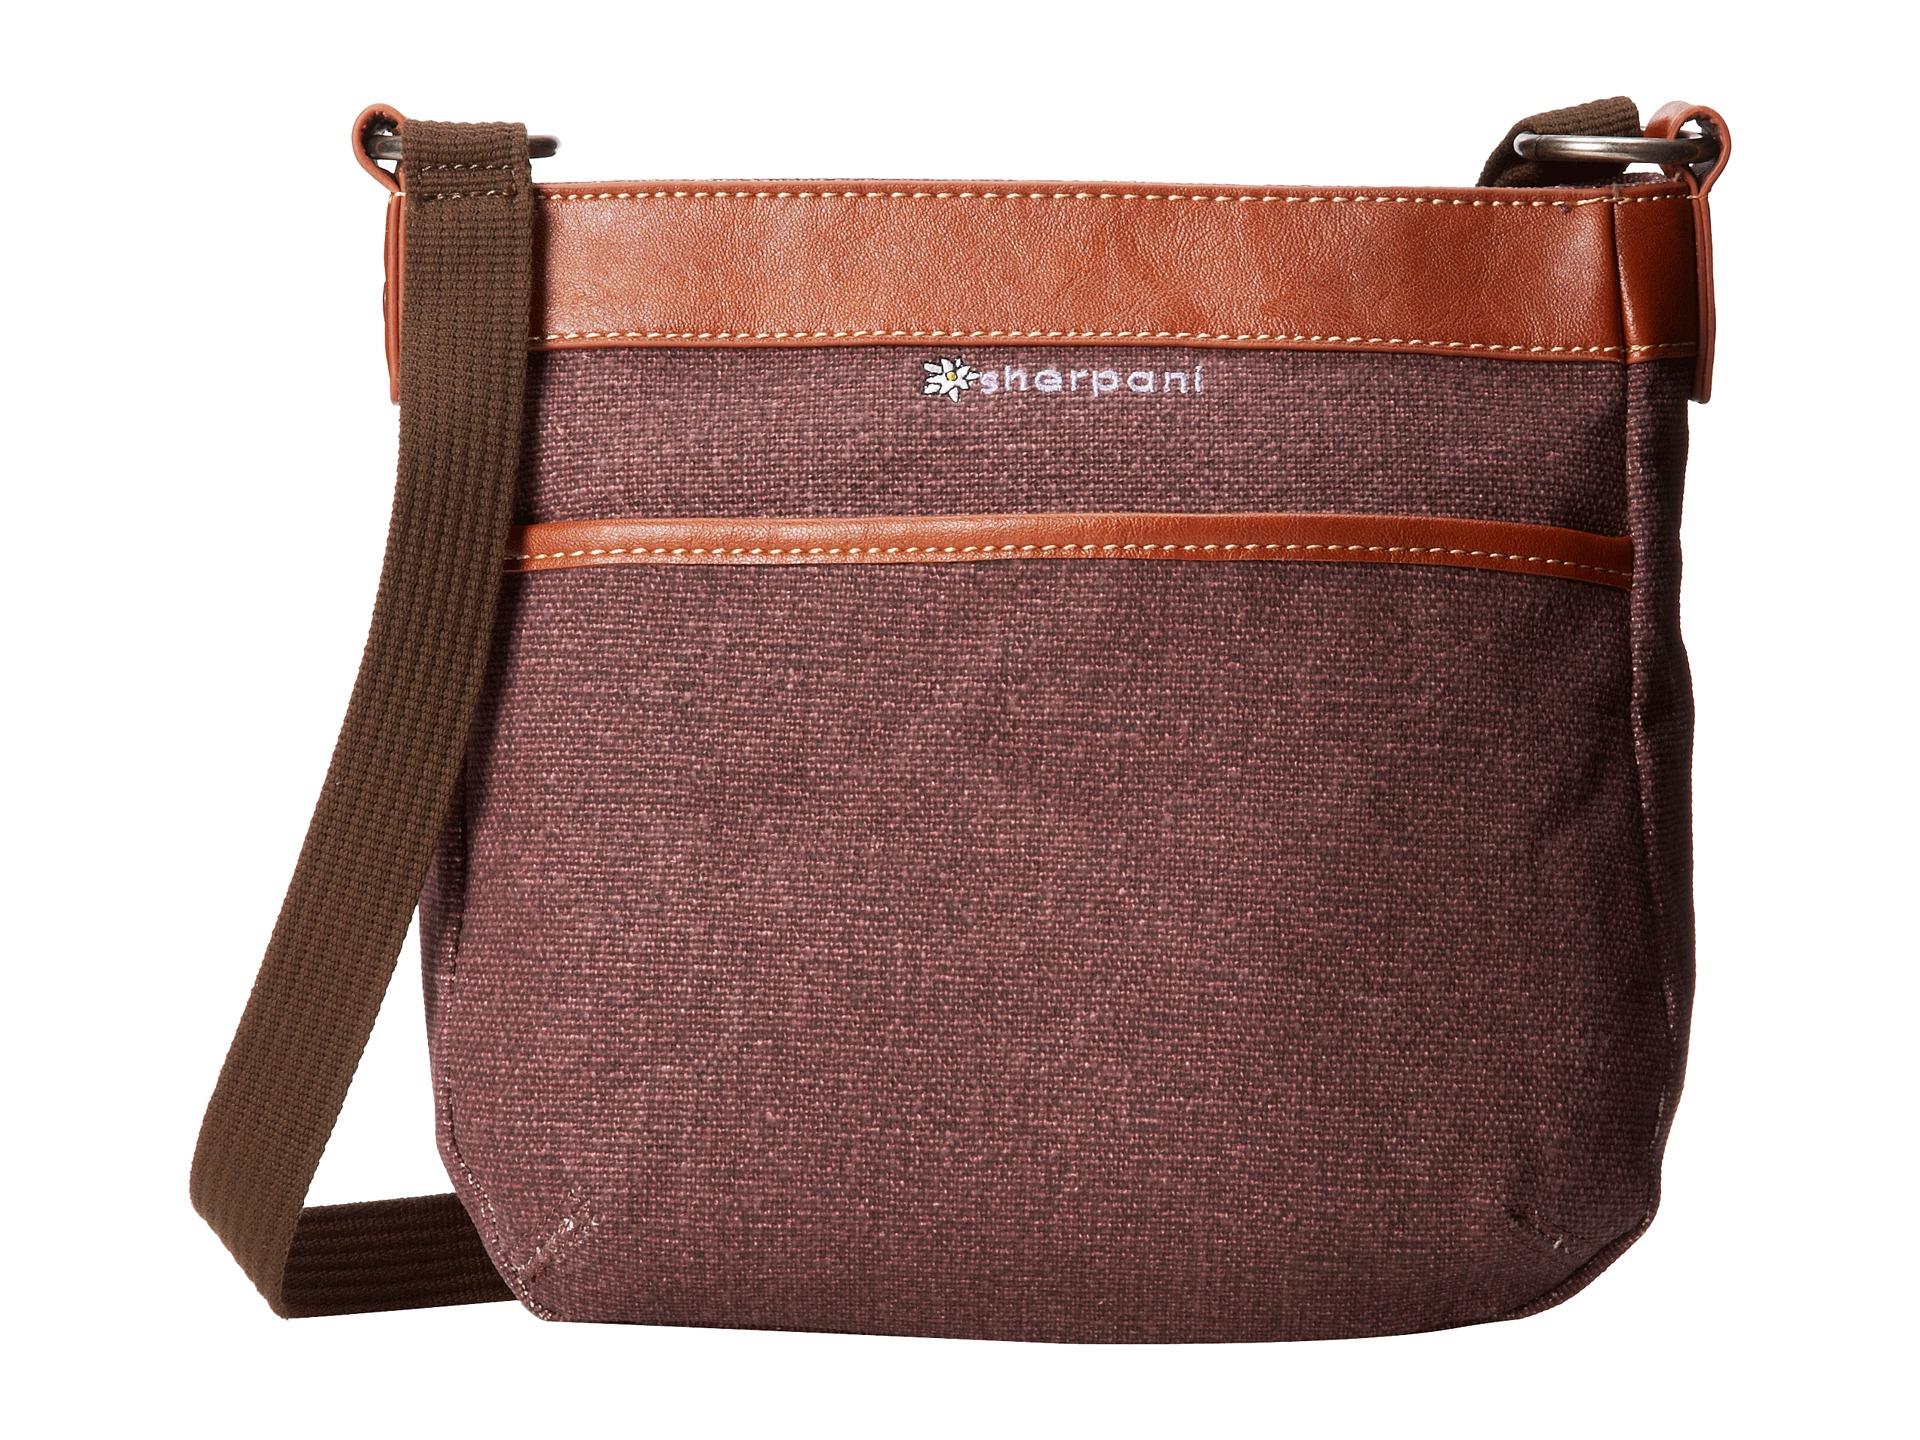 Sherpani Willow Shoulder Bag 54